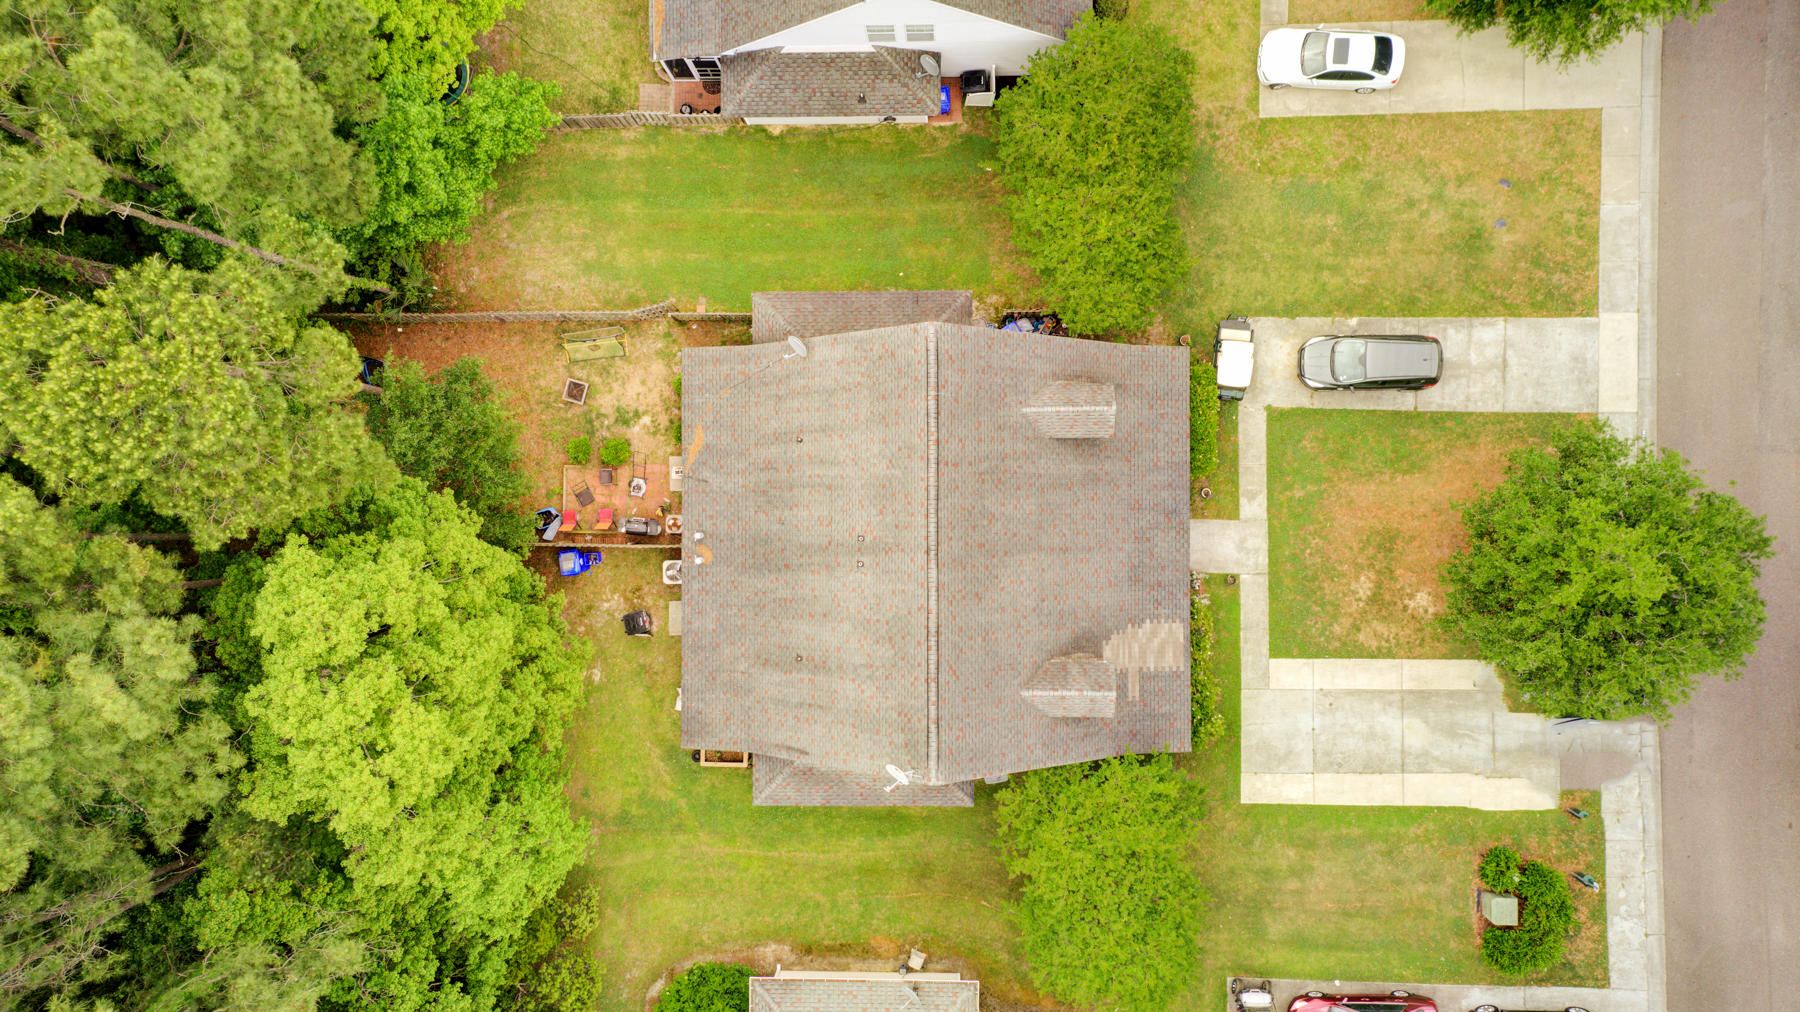 Dunes West Homes For Sale - 2232 Kings Gate, Mount Pleasant, SC - 0